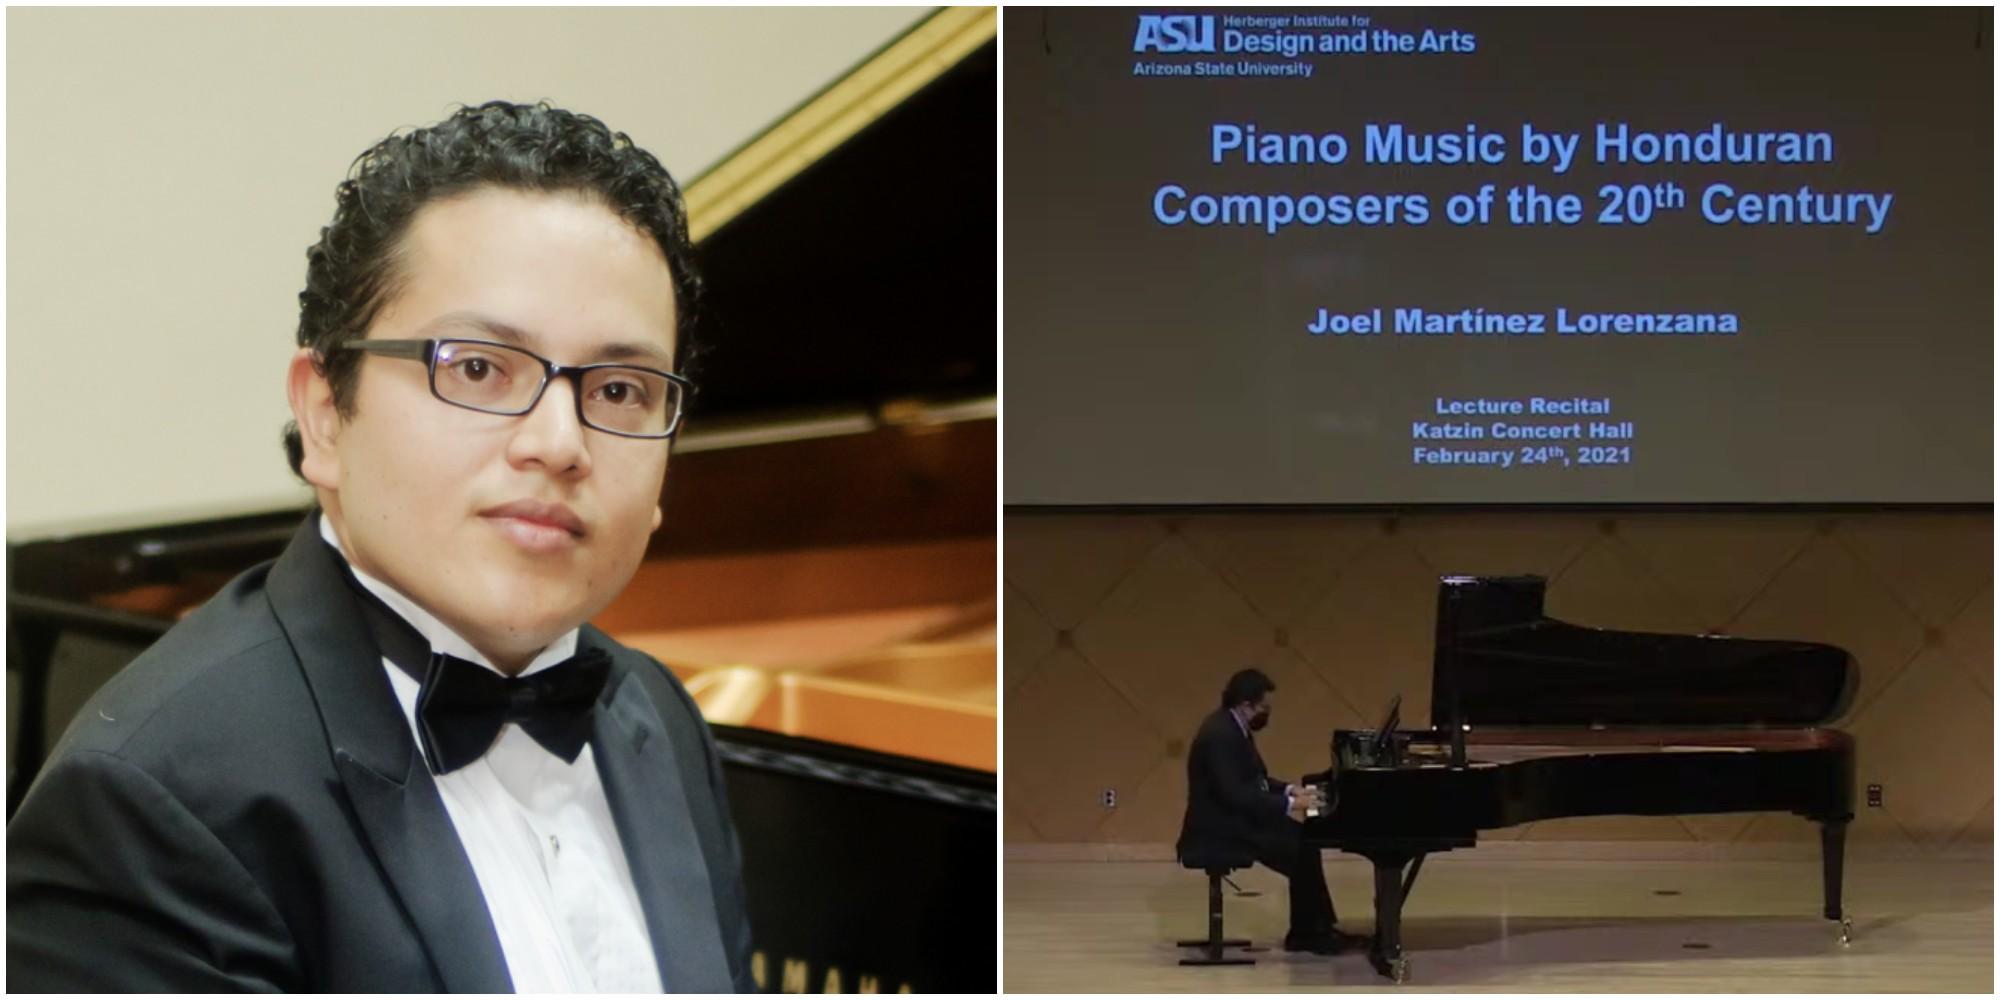 Hondureño destaca en la Arizona State University gracias a su música